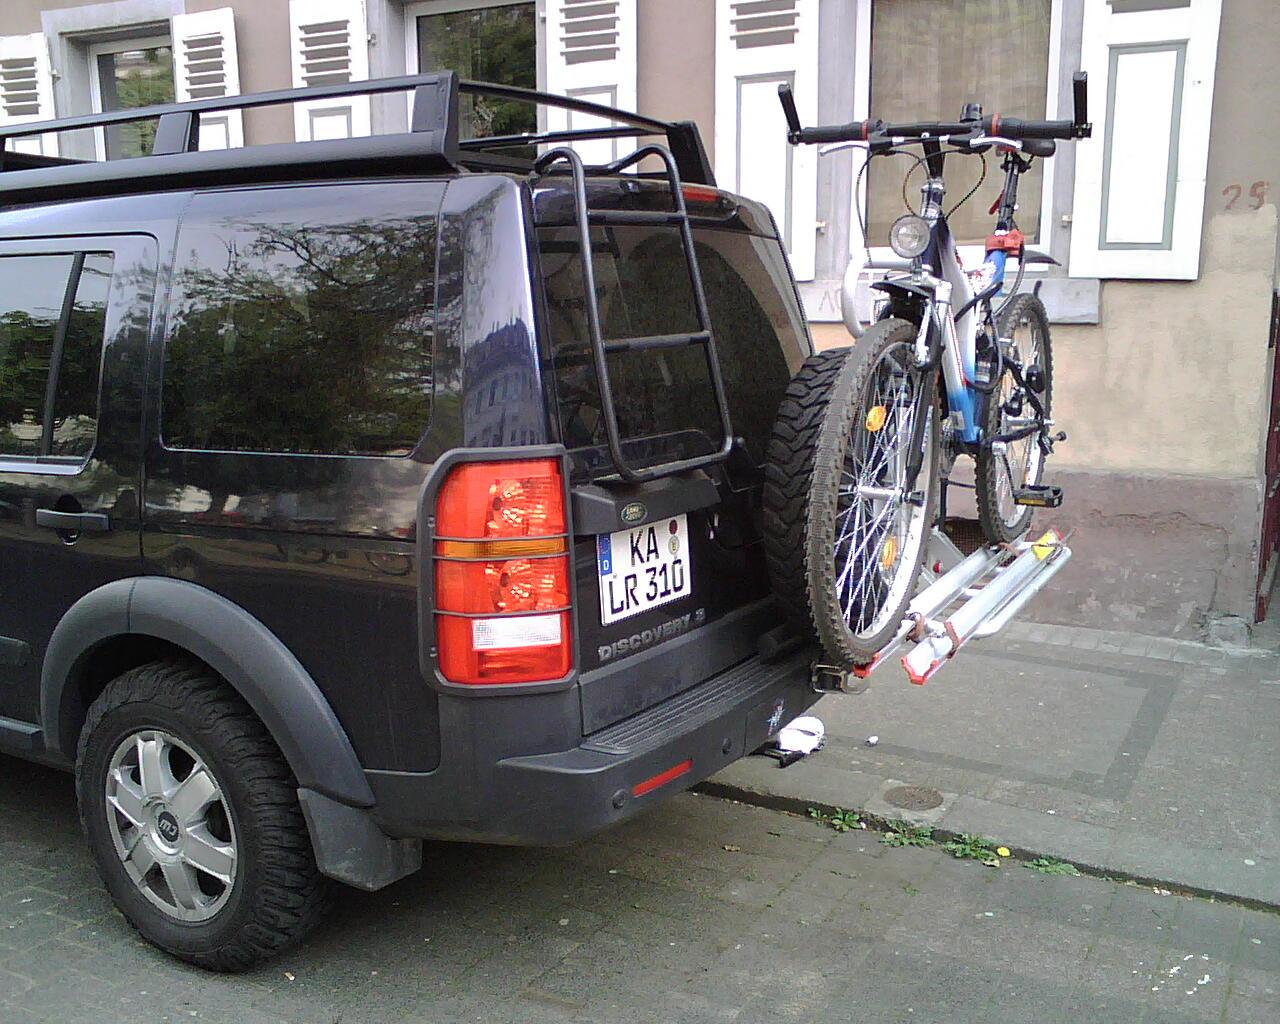 fahrradtr ger worauf achten atudo. Black Bedroom Furniture Sets. Home Design Ideas